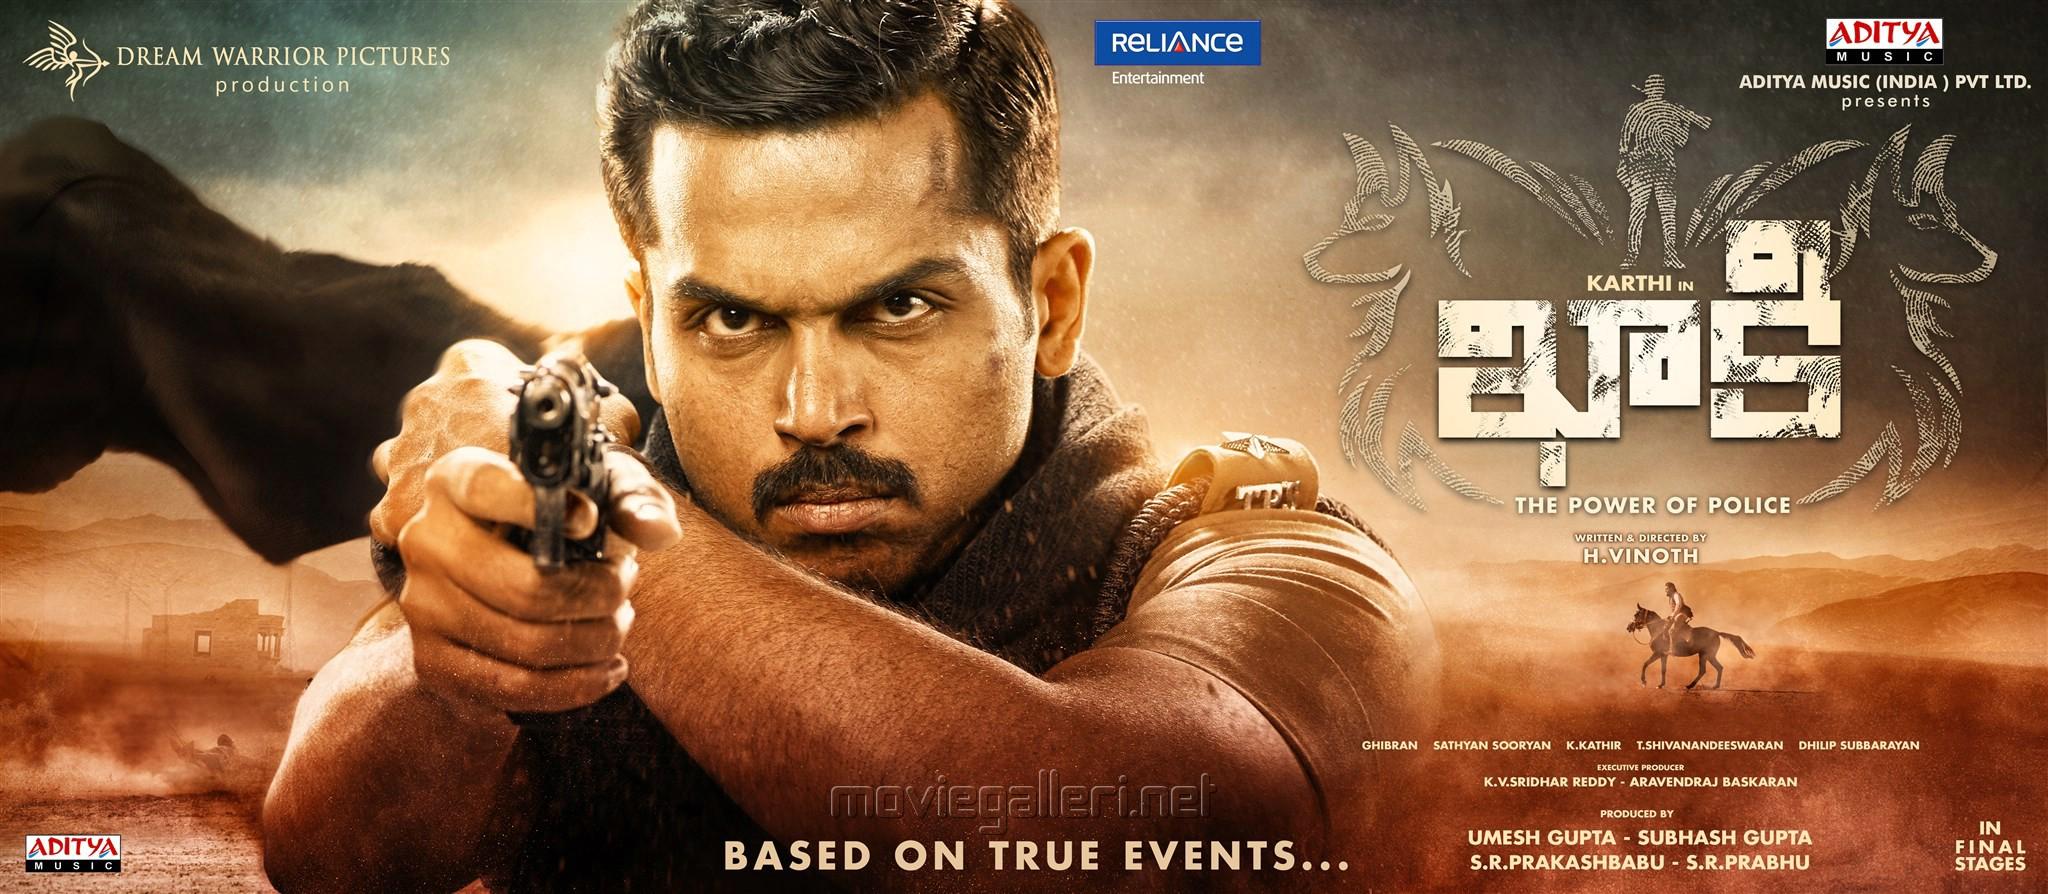 Actor Karthi coming as 'Khaki' -The Power of Police in Telugu